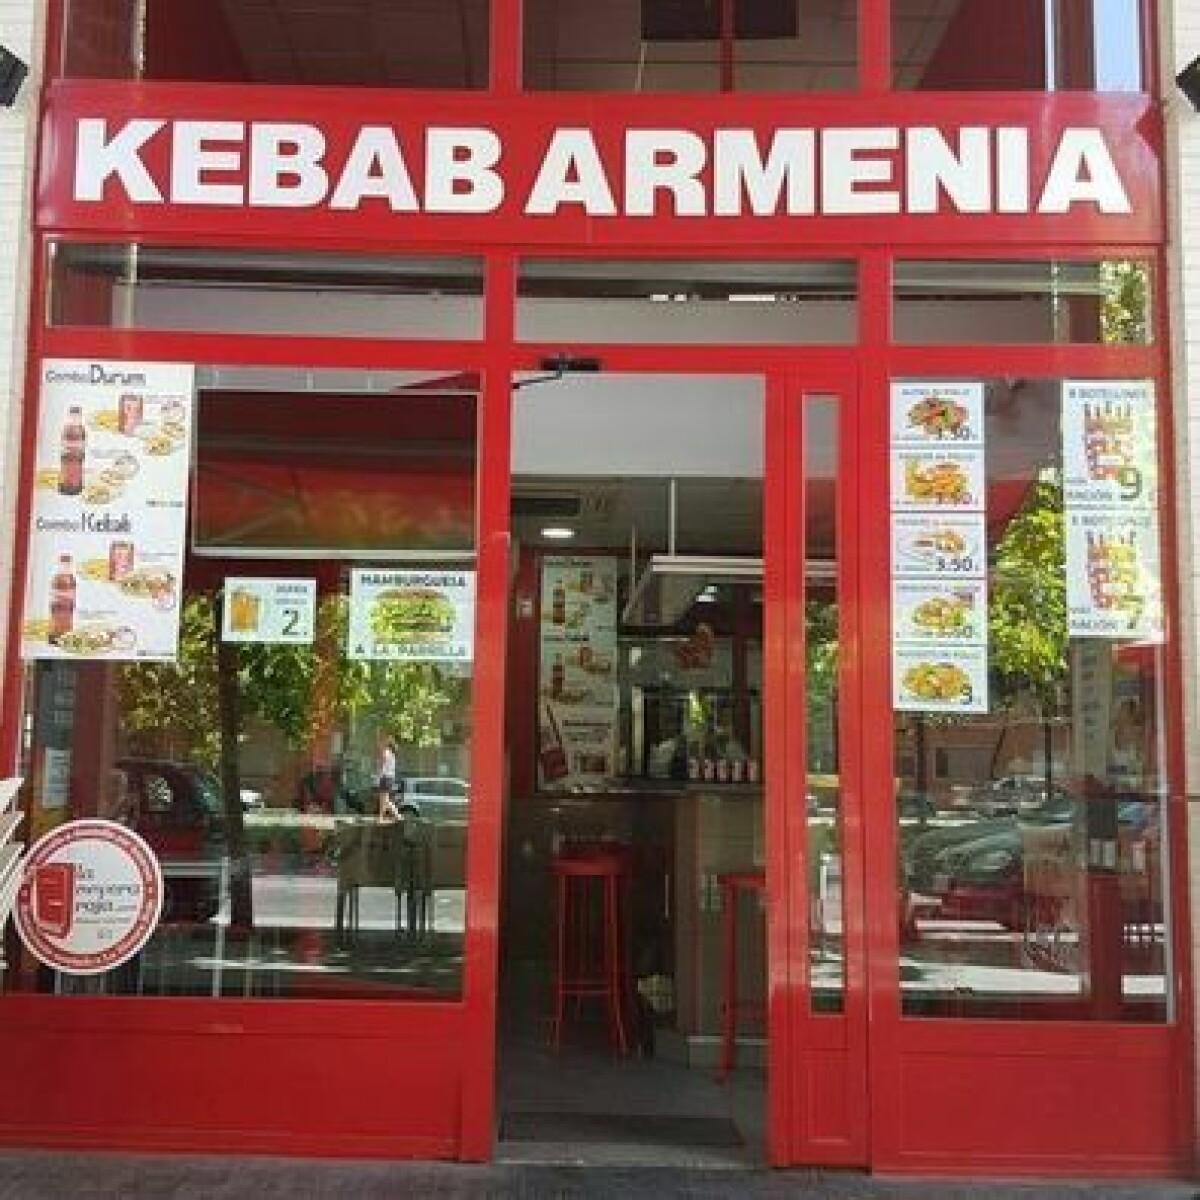 TELE KEBAB ARMENIA